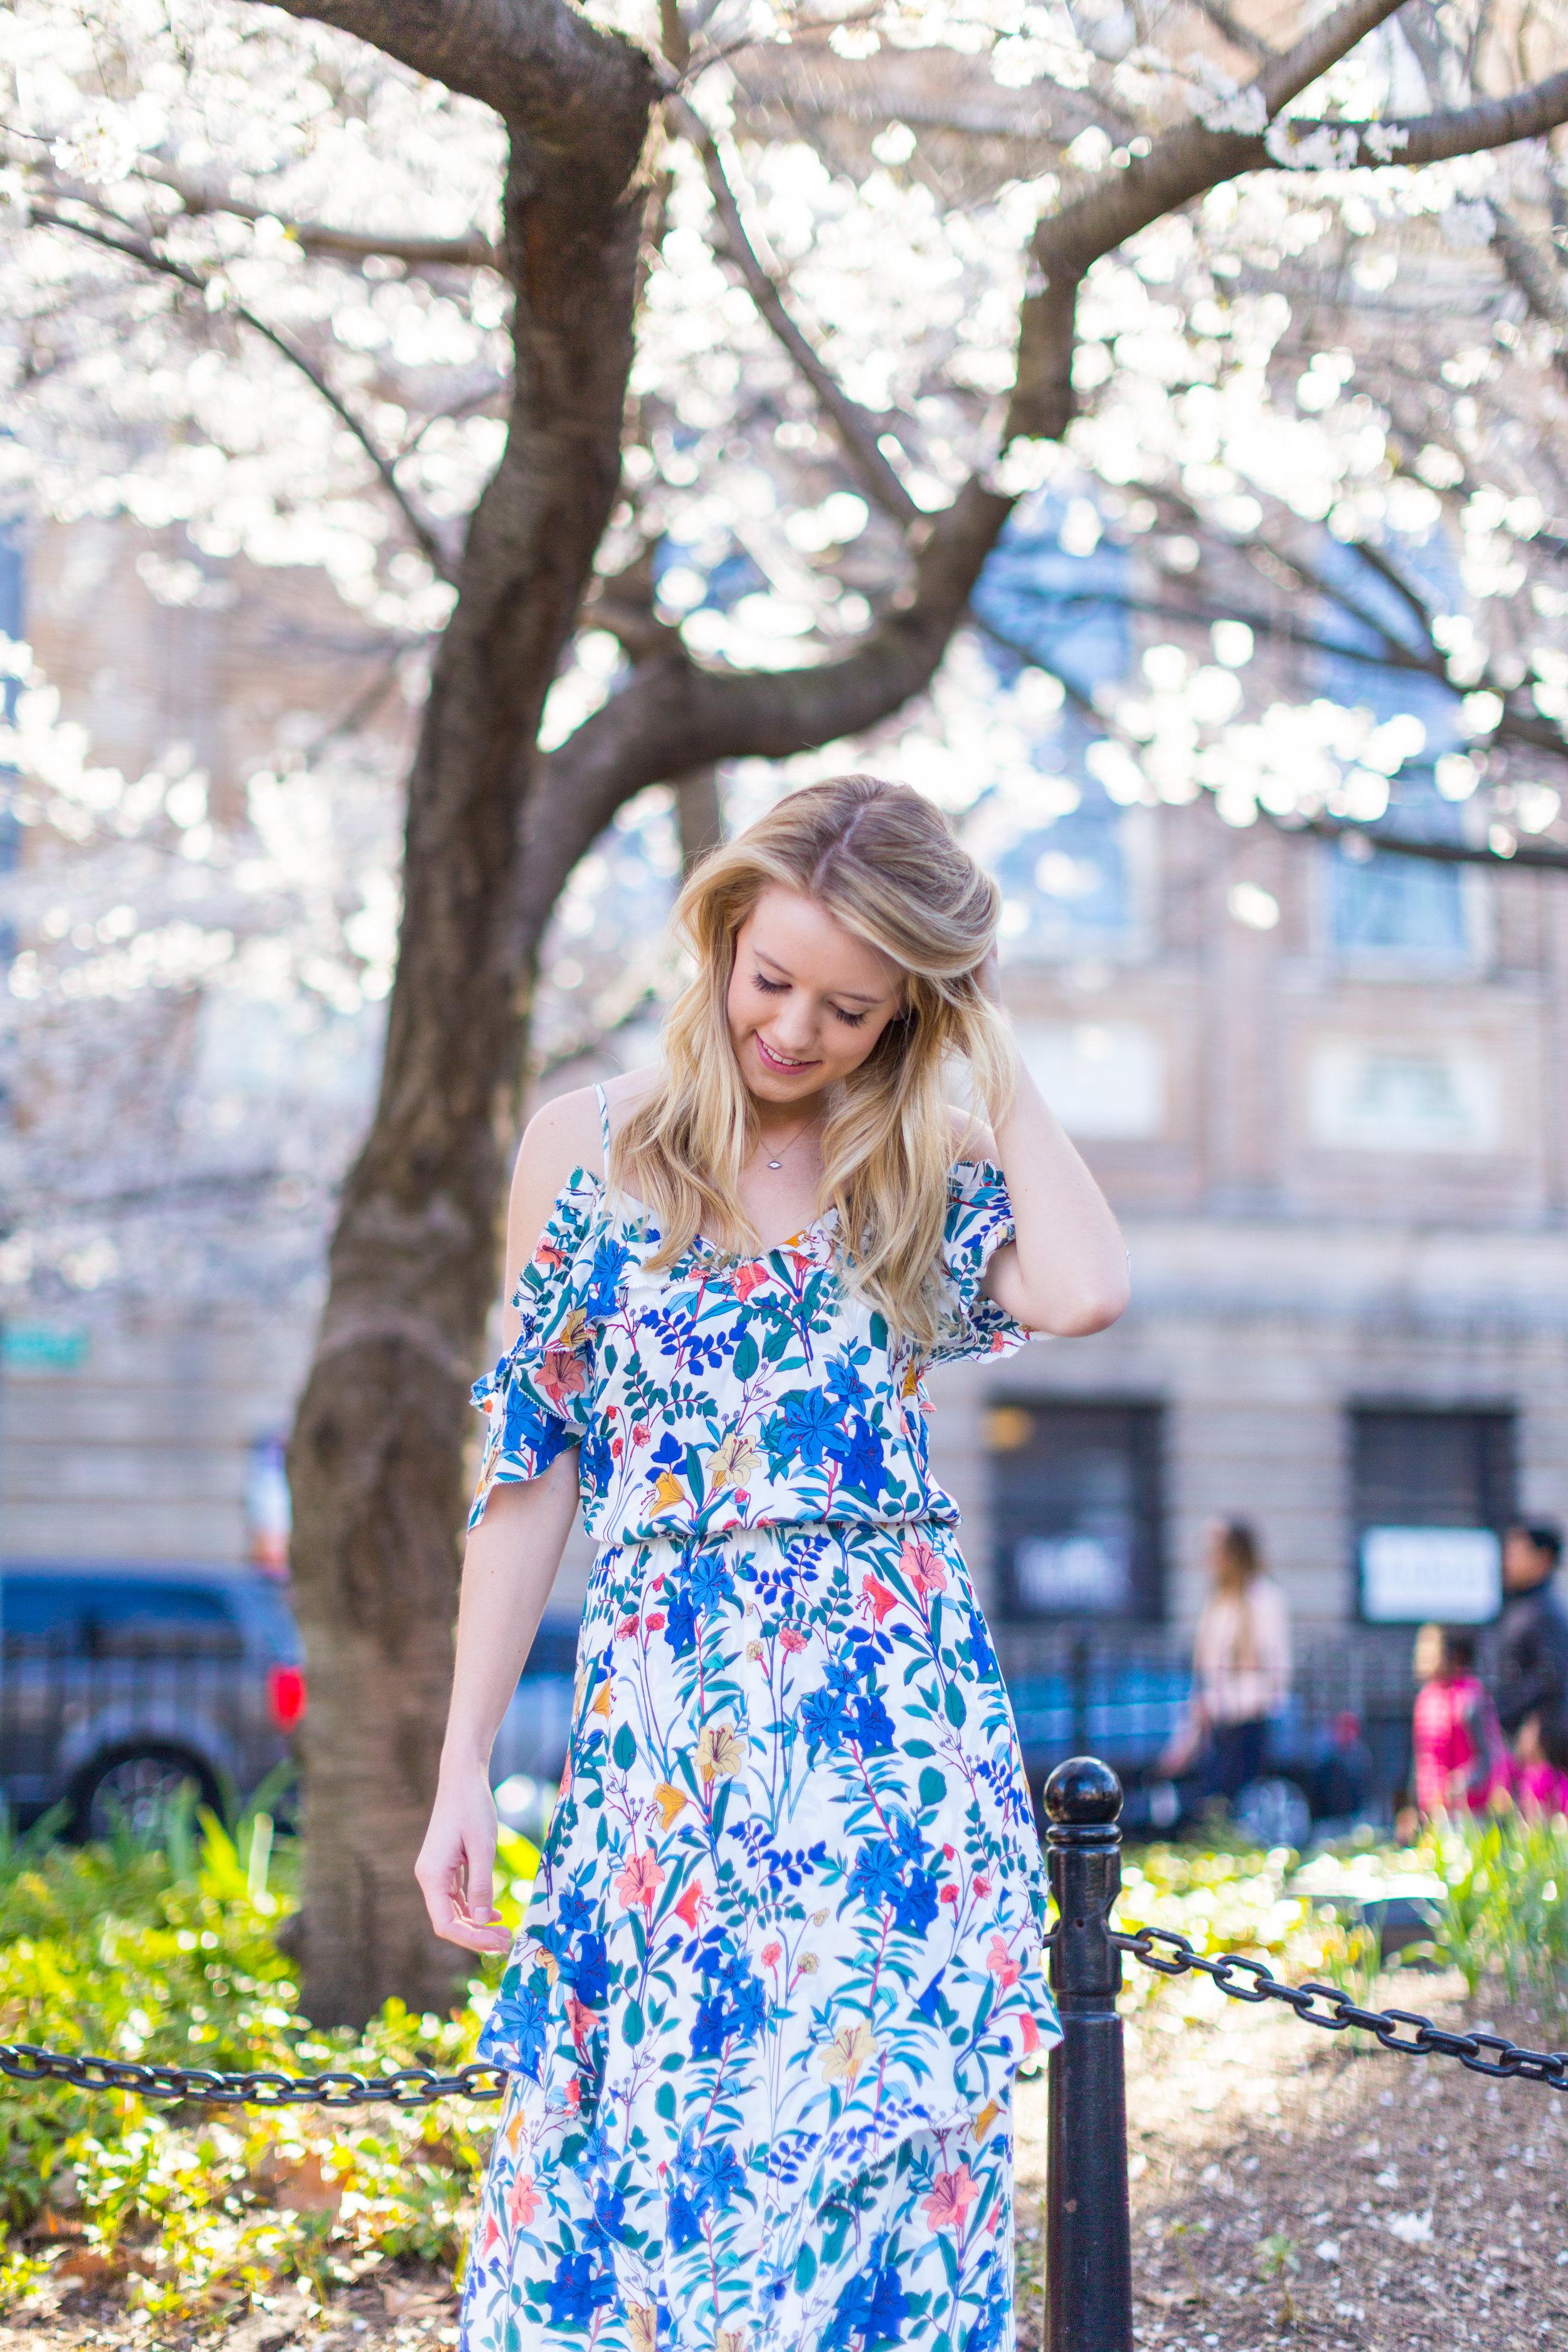 Ruffle Spring Floral Dress Washington Square Park NYC-3.jpg